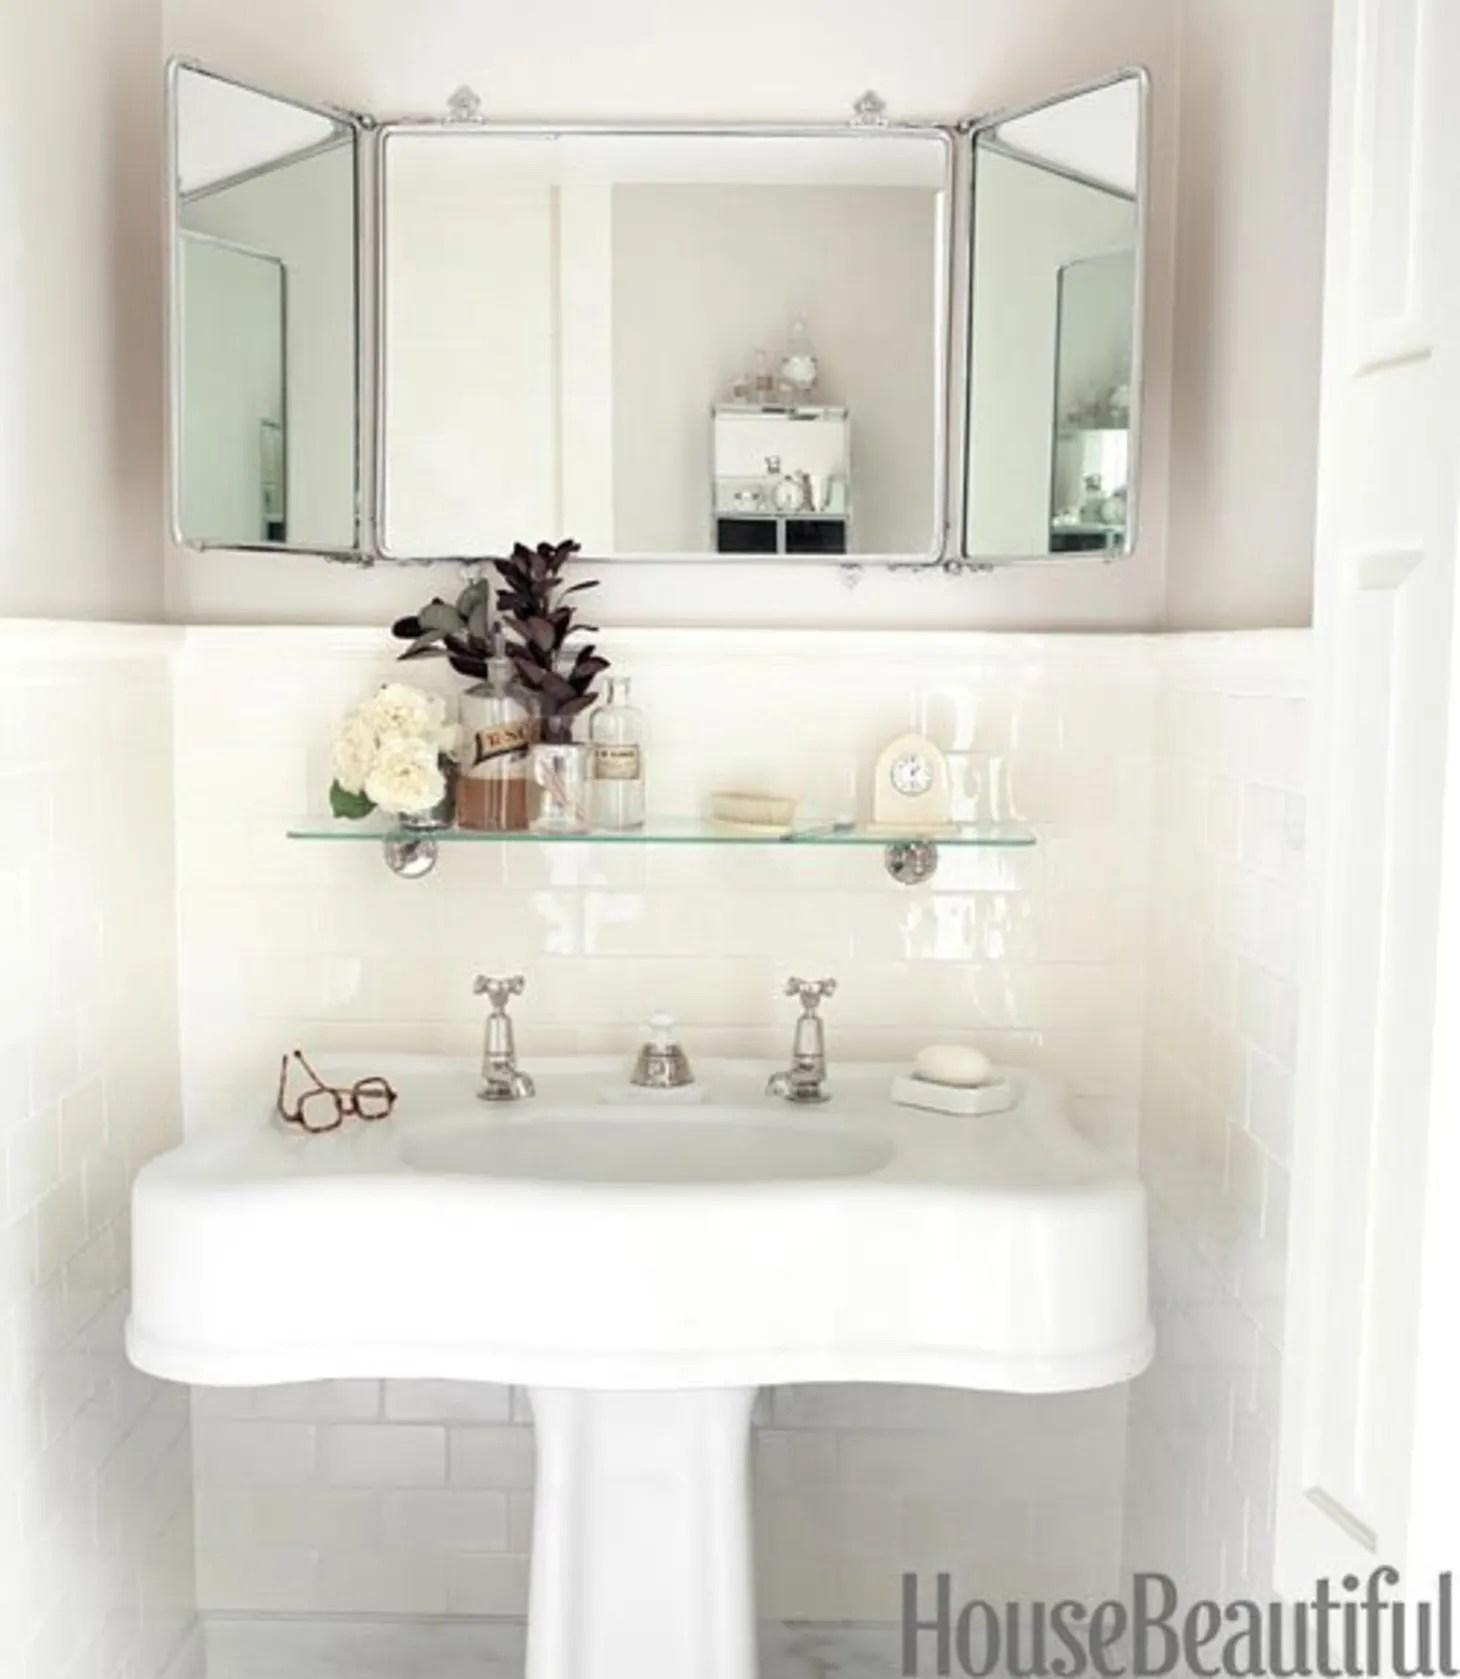 Bathroom Storage Ideas - Storage For Small Bathrooms ... on Small Apartment Bathroom Storage Ideas  id=38401